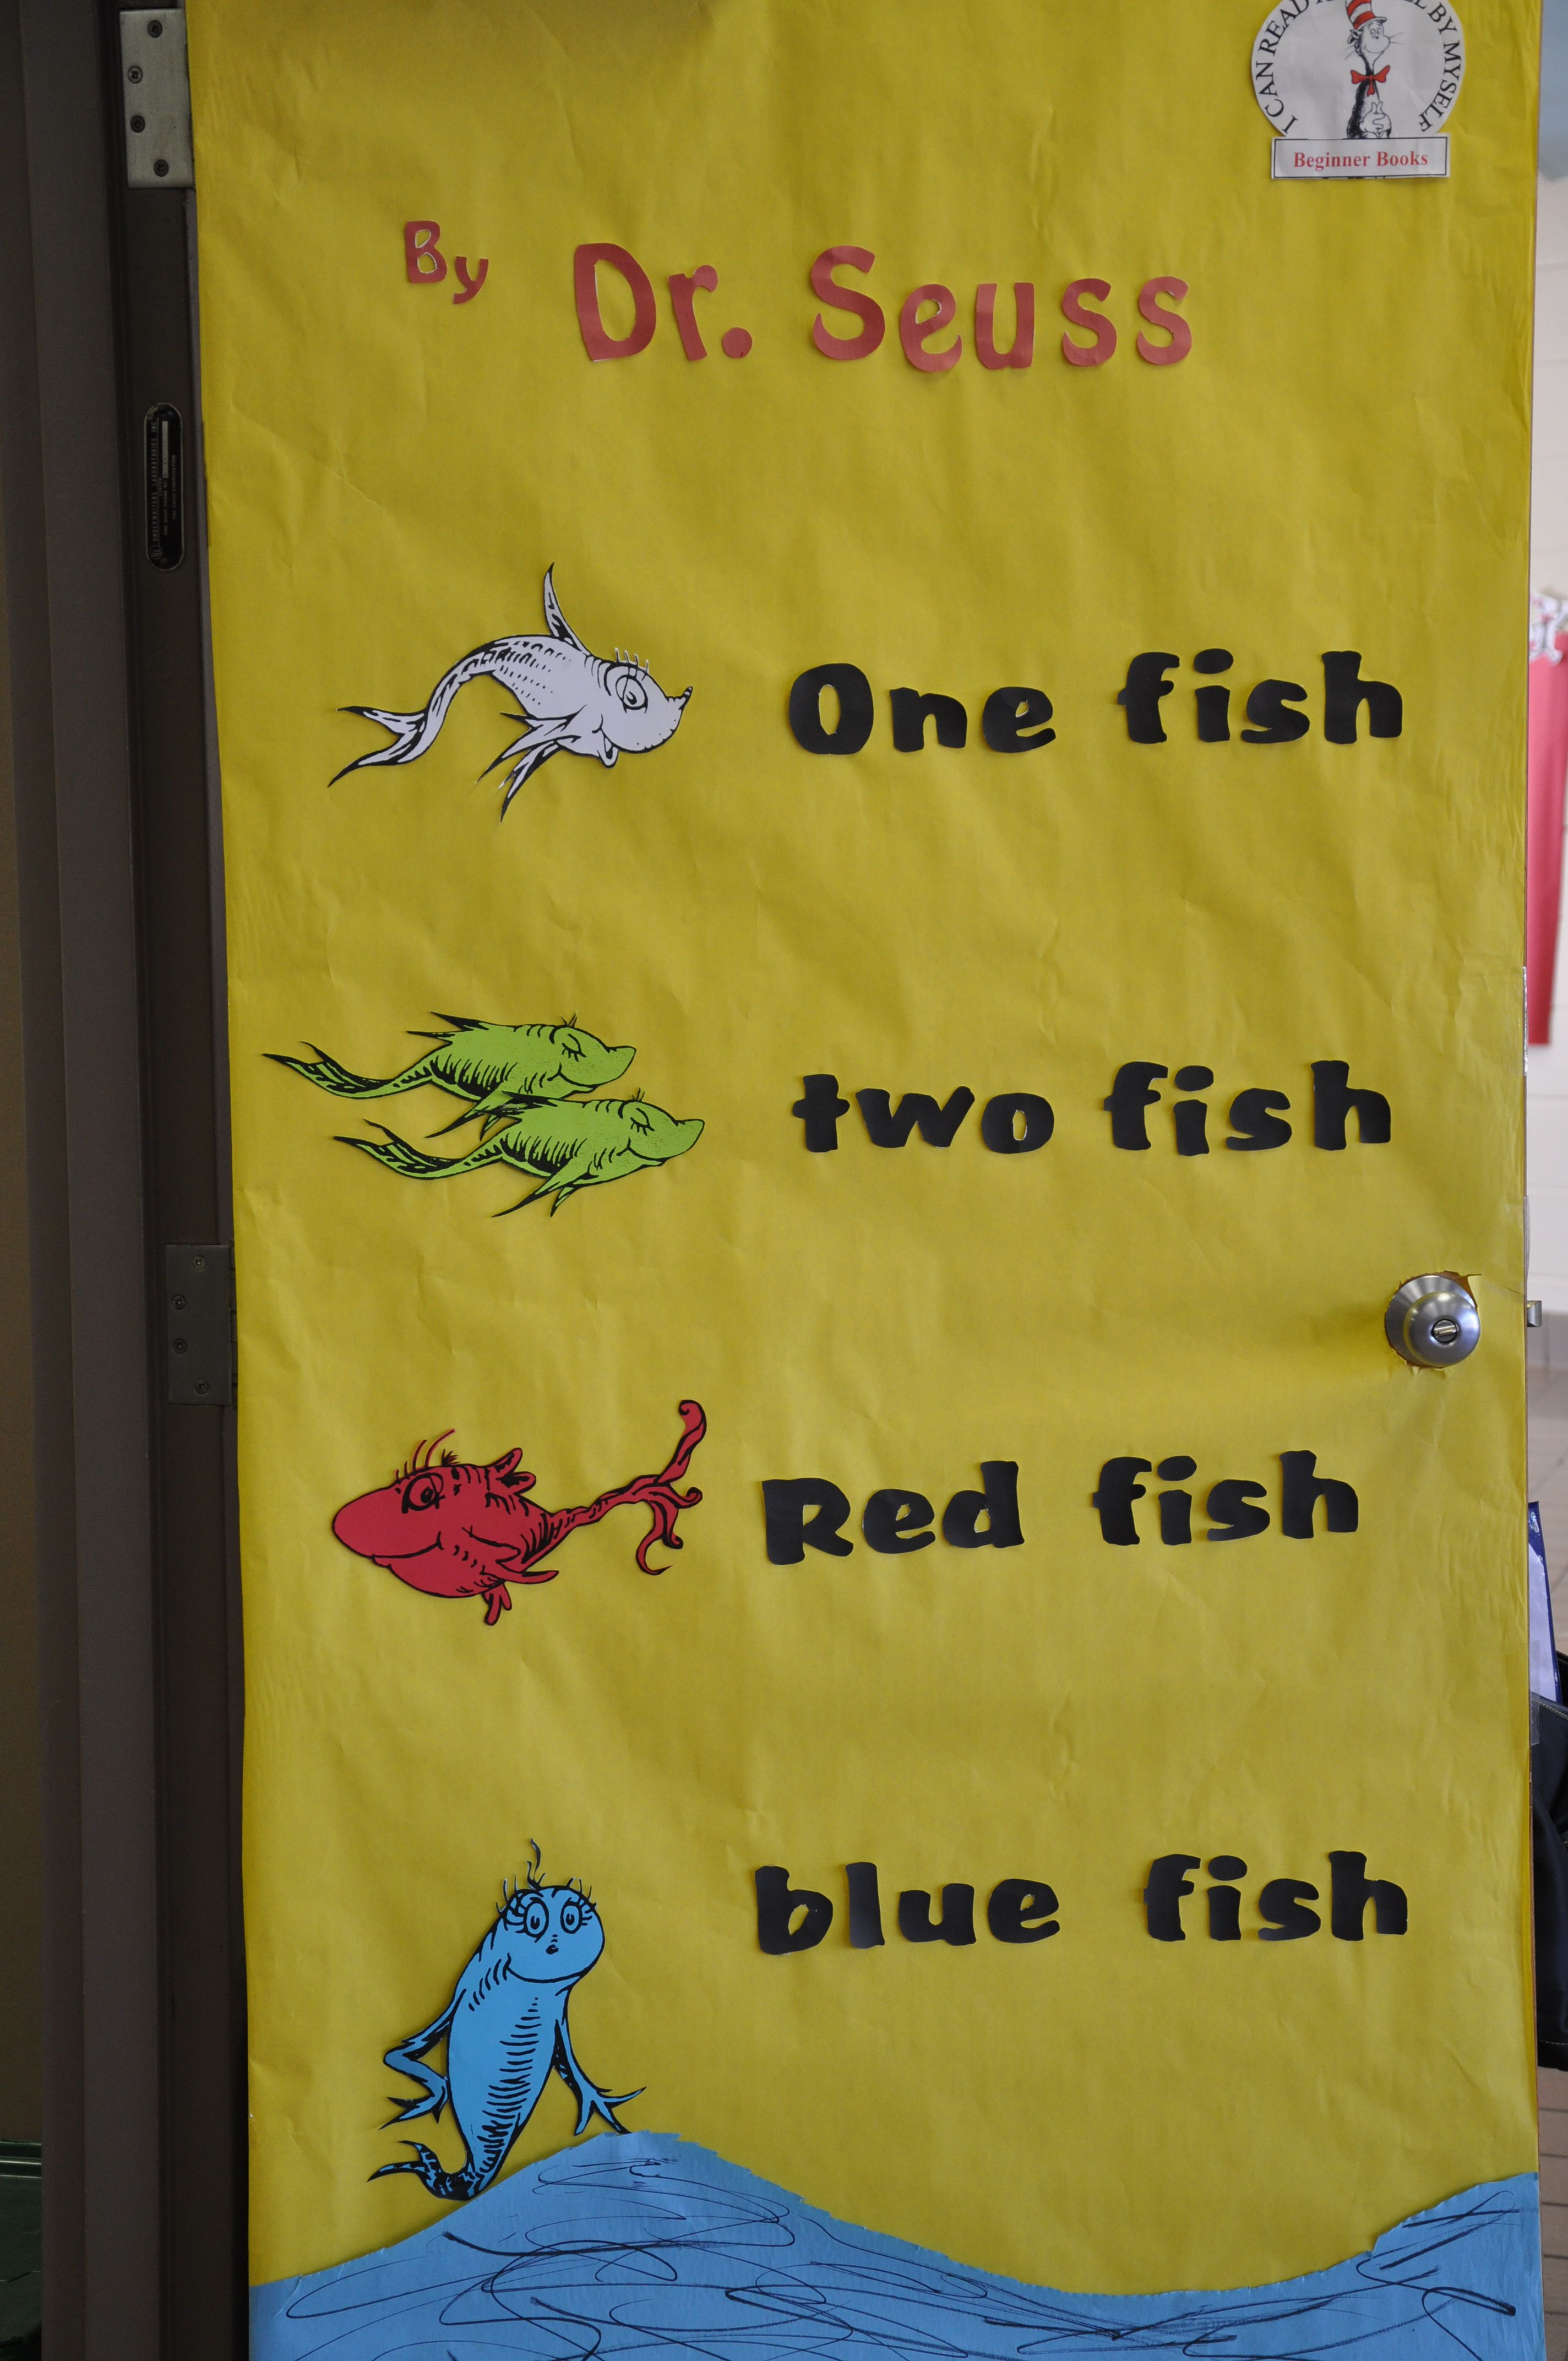 dr seuss pdf one fish two fish